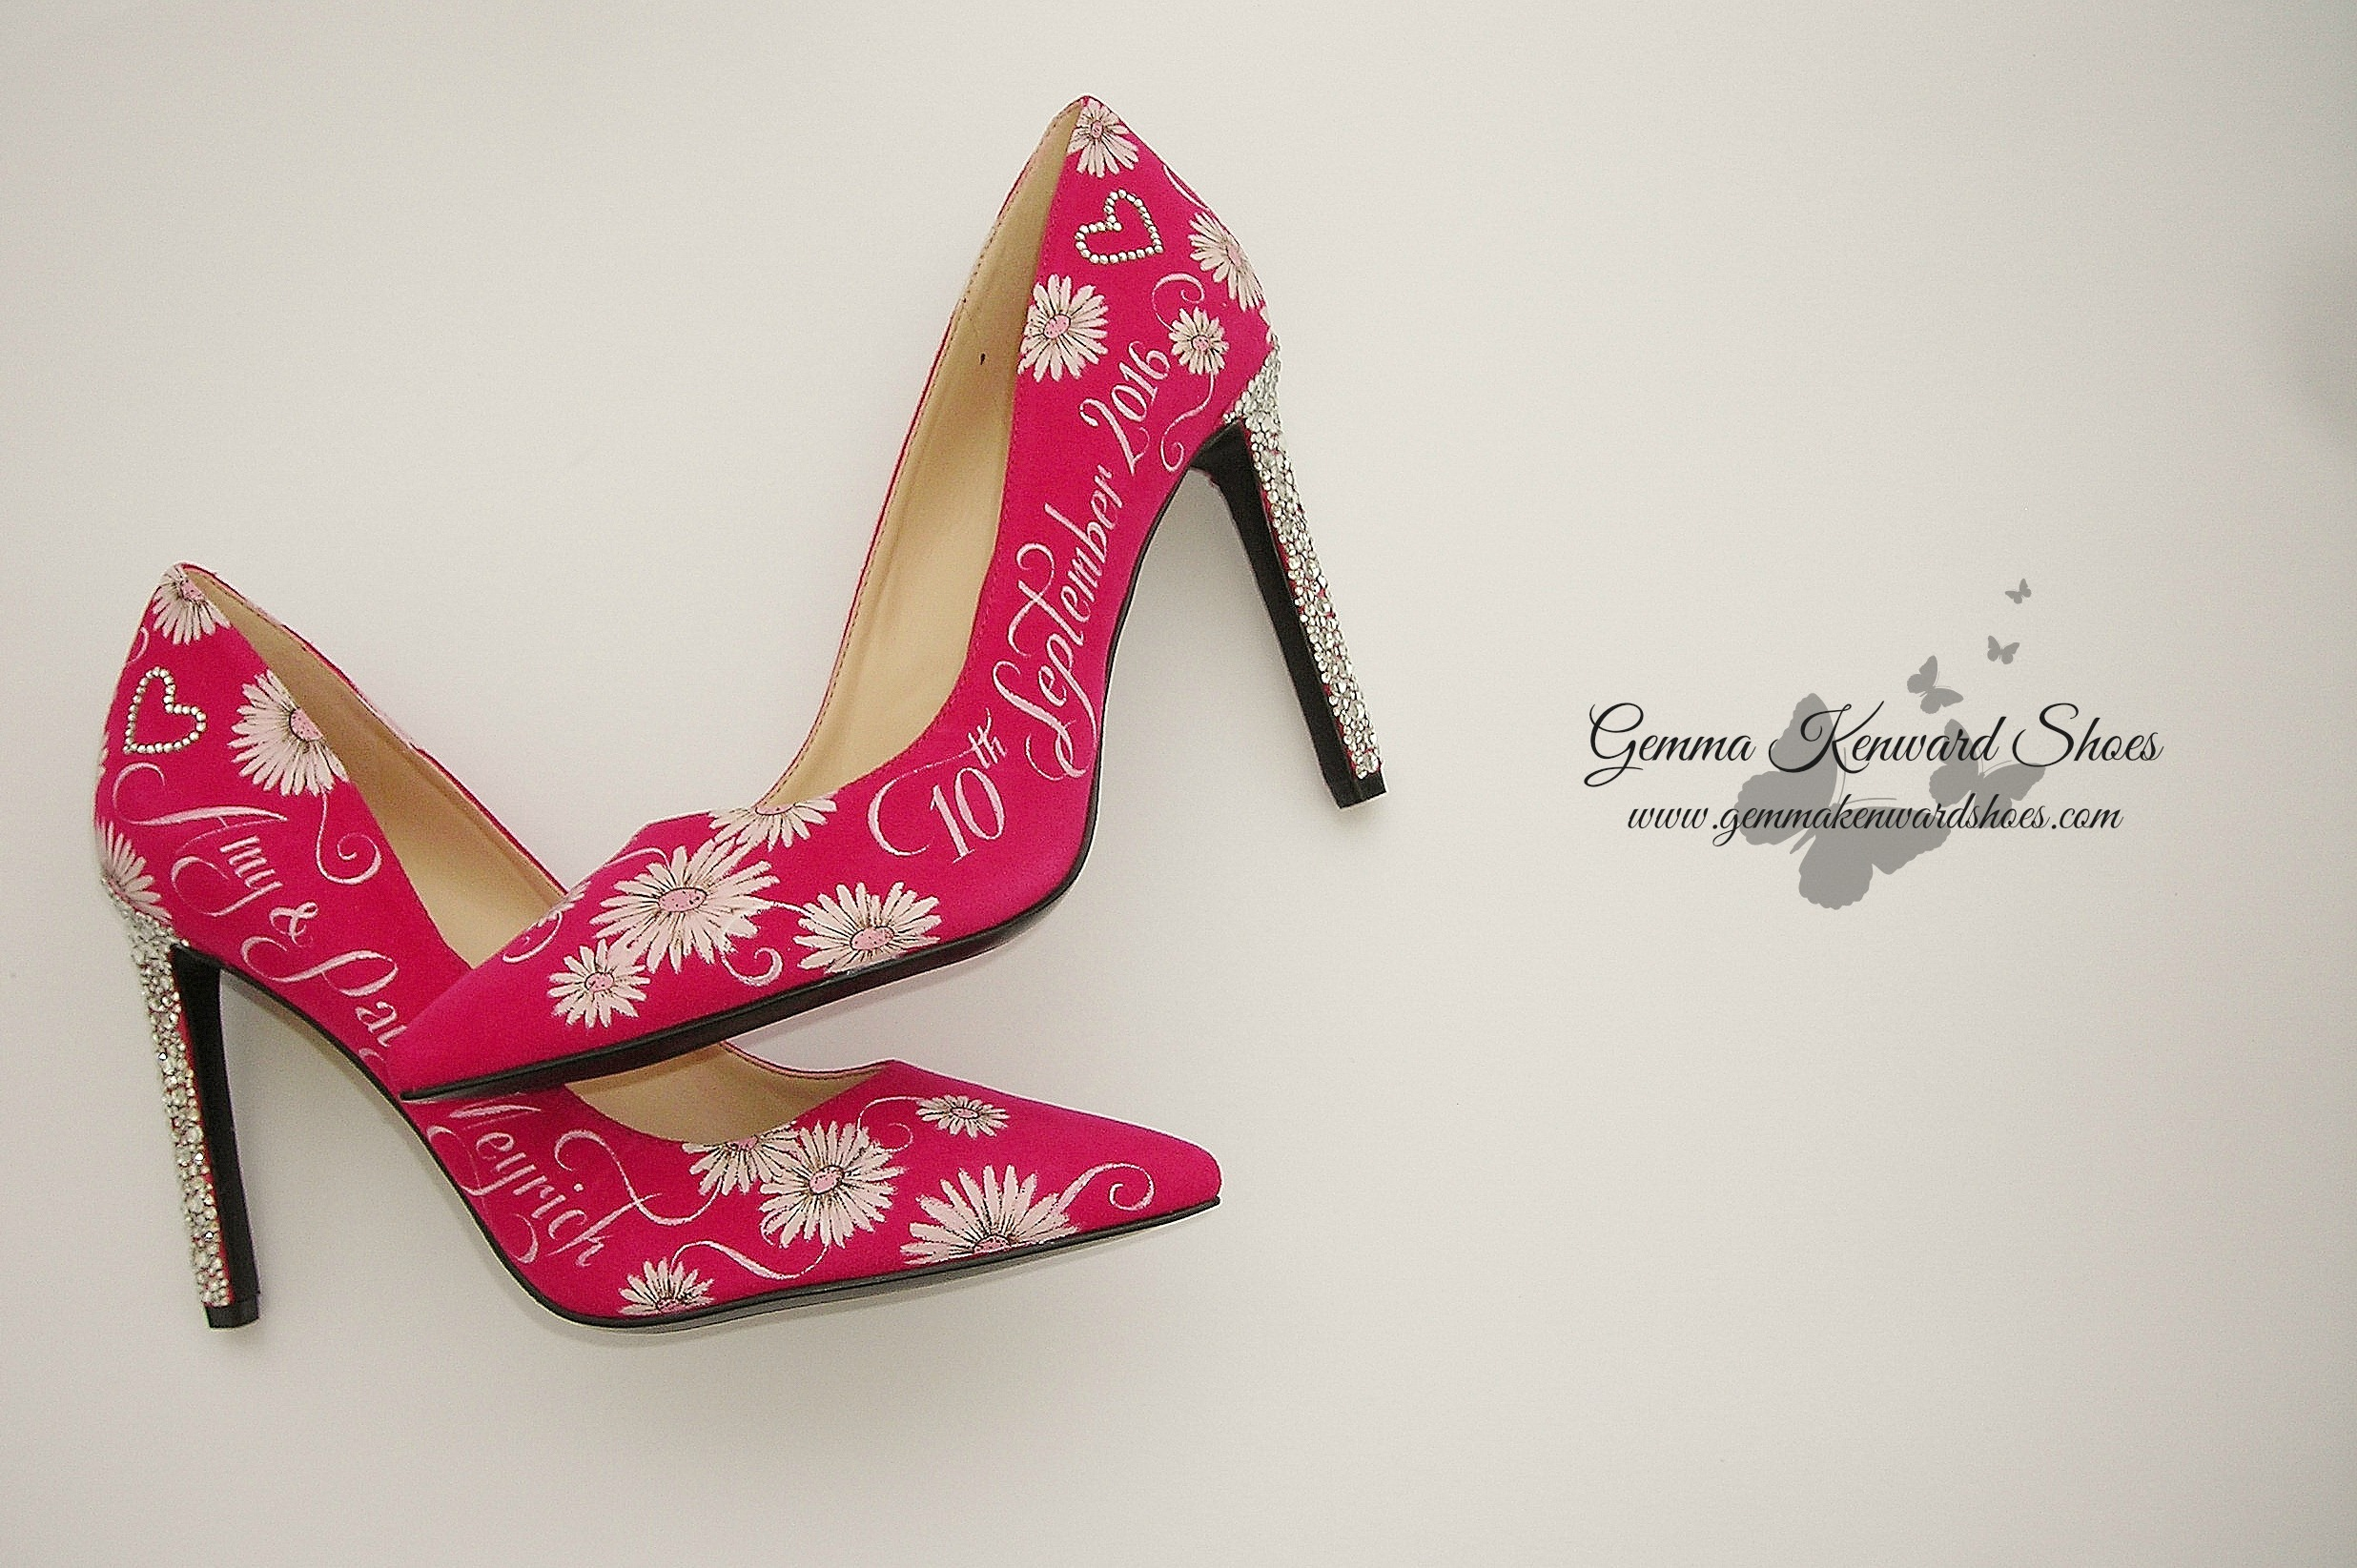 Hand painted wedding shoes with gerbera flowers and Swarovski diamante heels